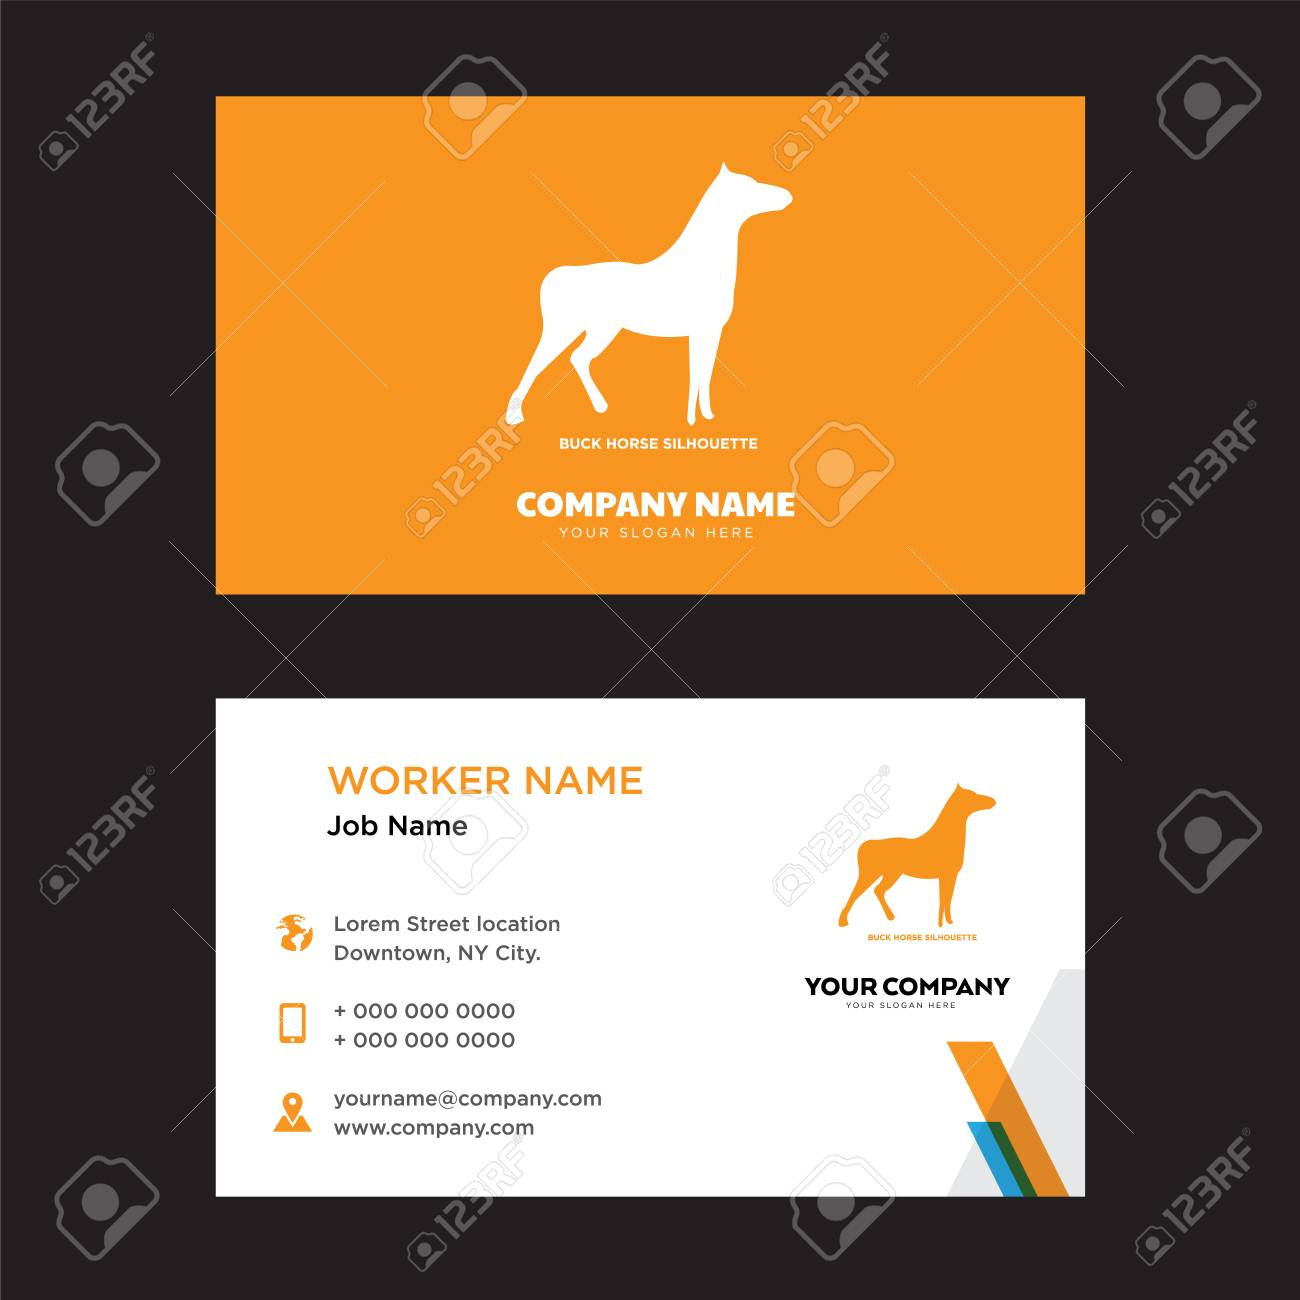 Buck horse business card design template visiting for your company buck horse business card design template visiting for your company modern horizontal identity card colourmoves